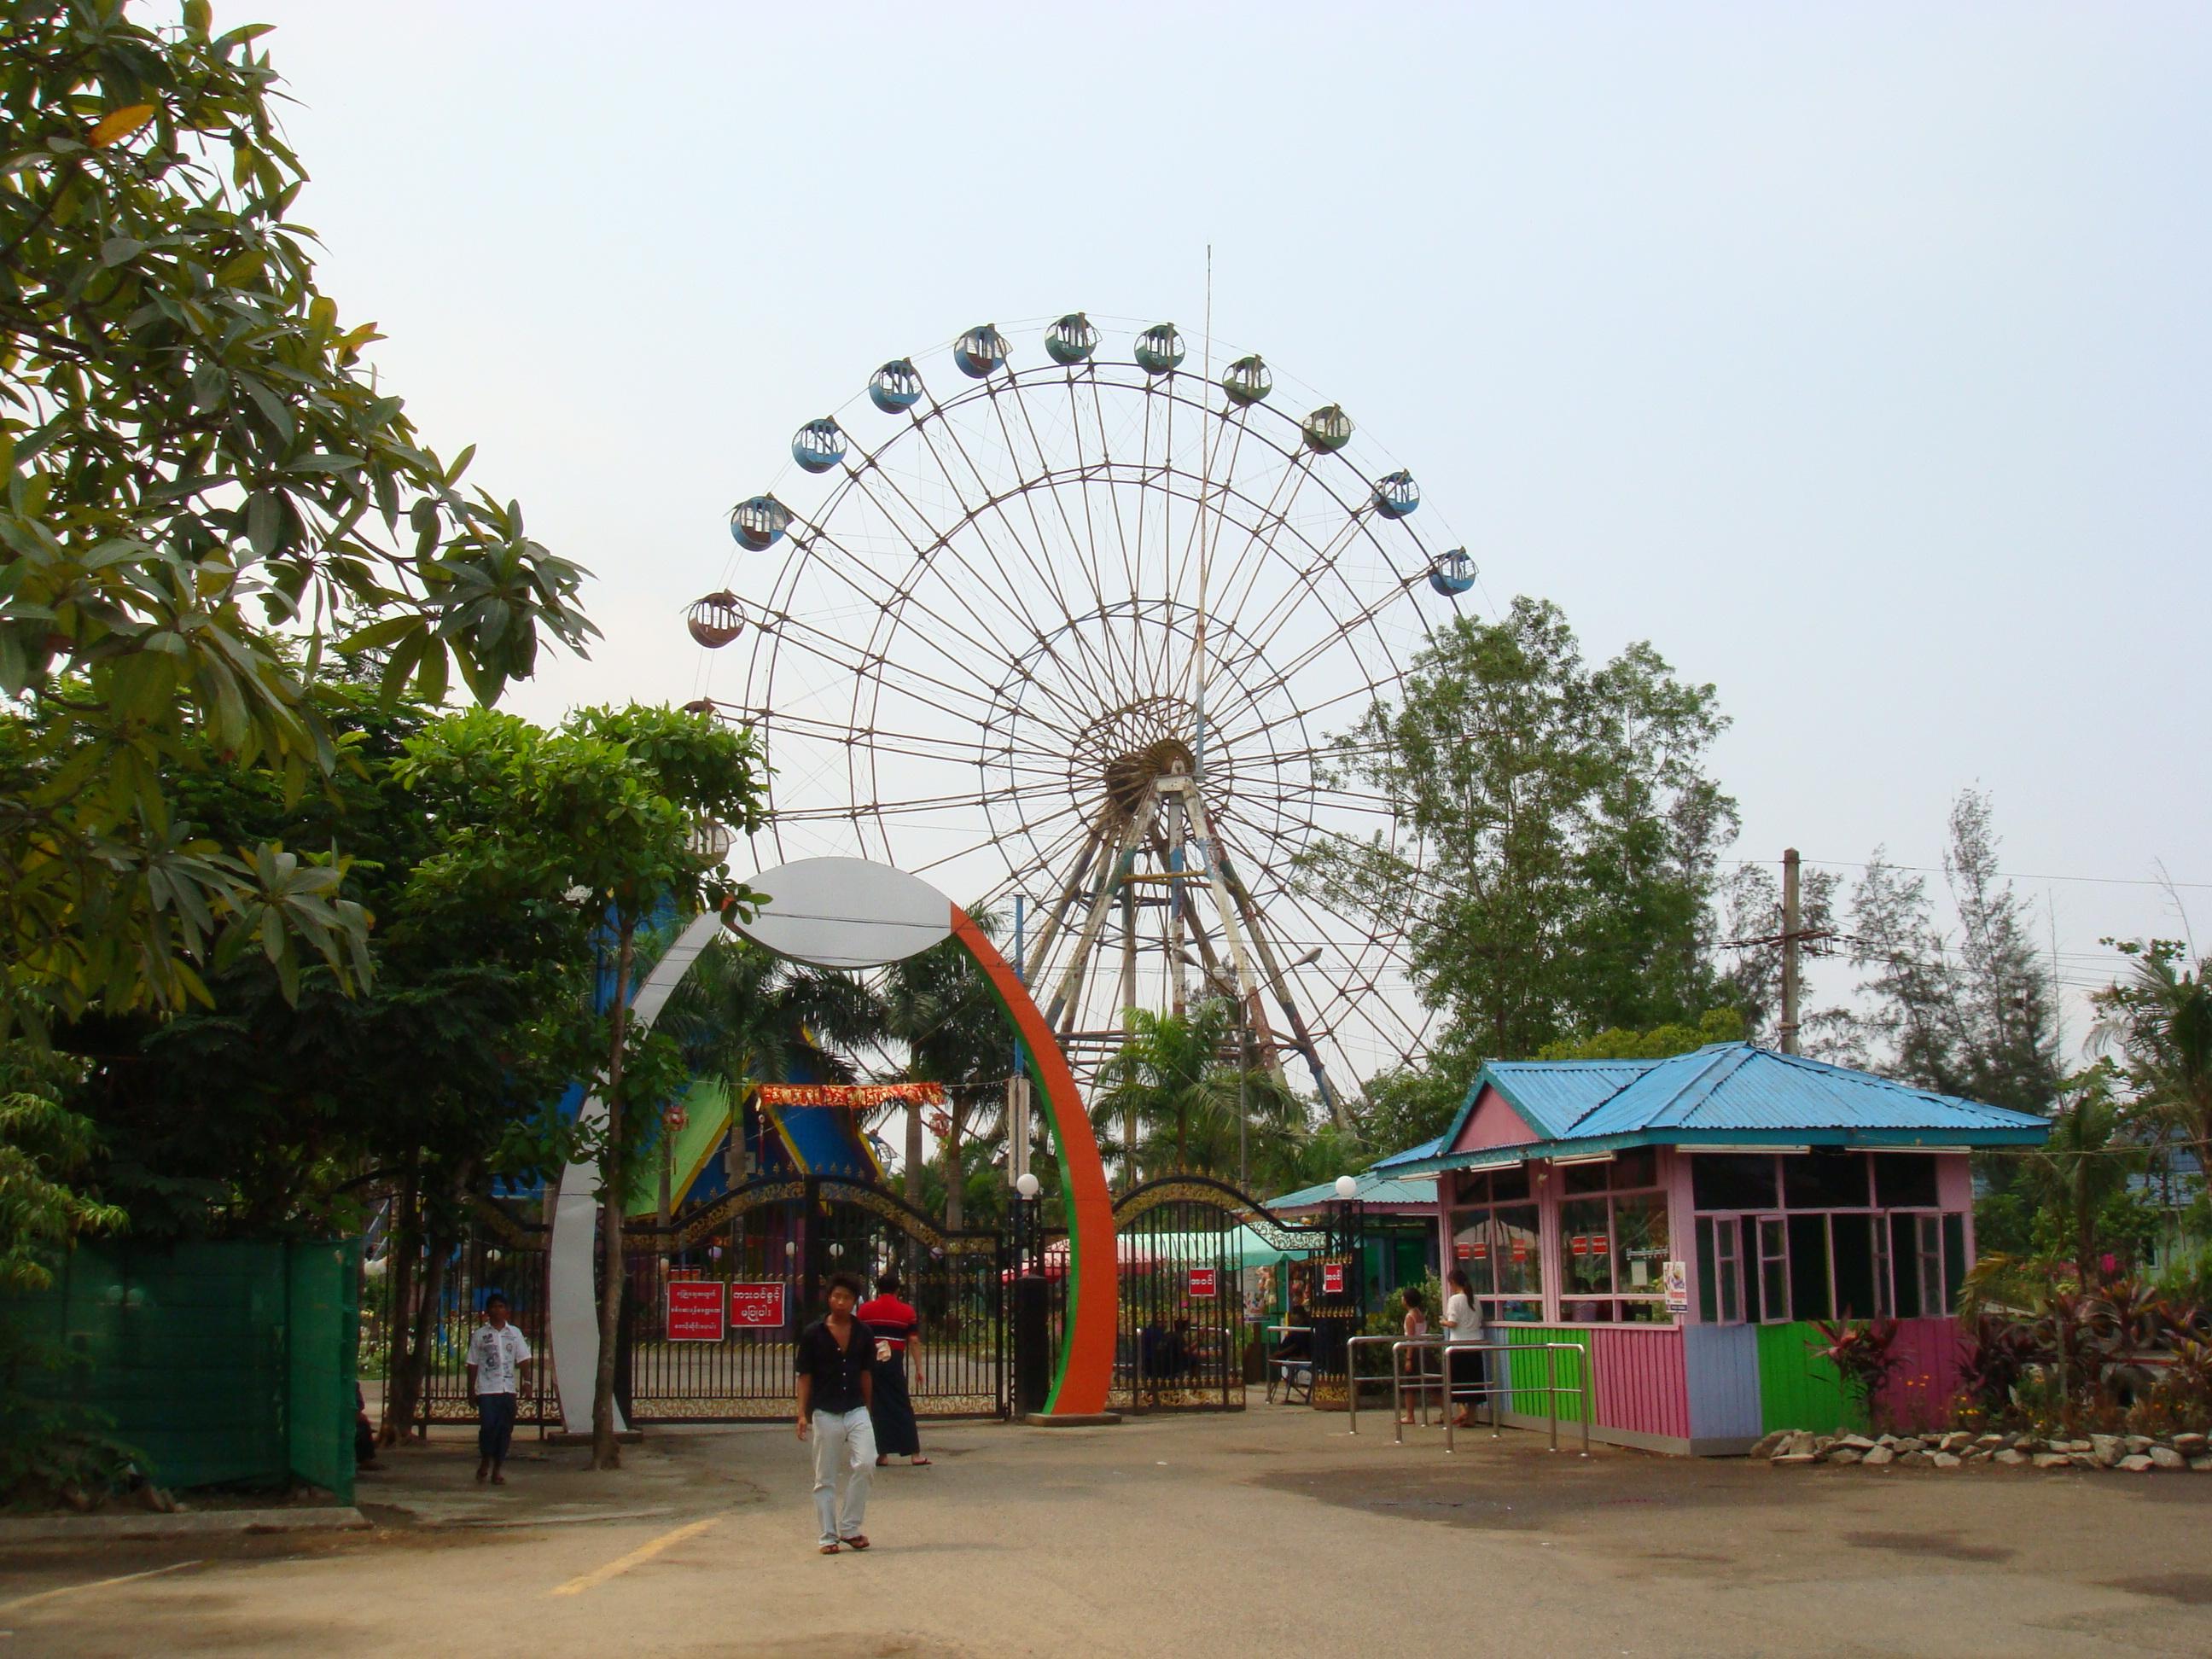 Amusement Parks In Fort Walton Beach Florida